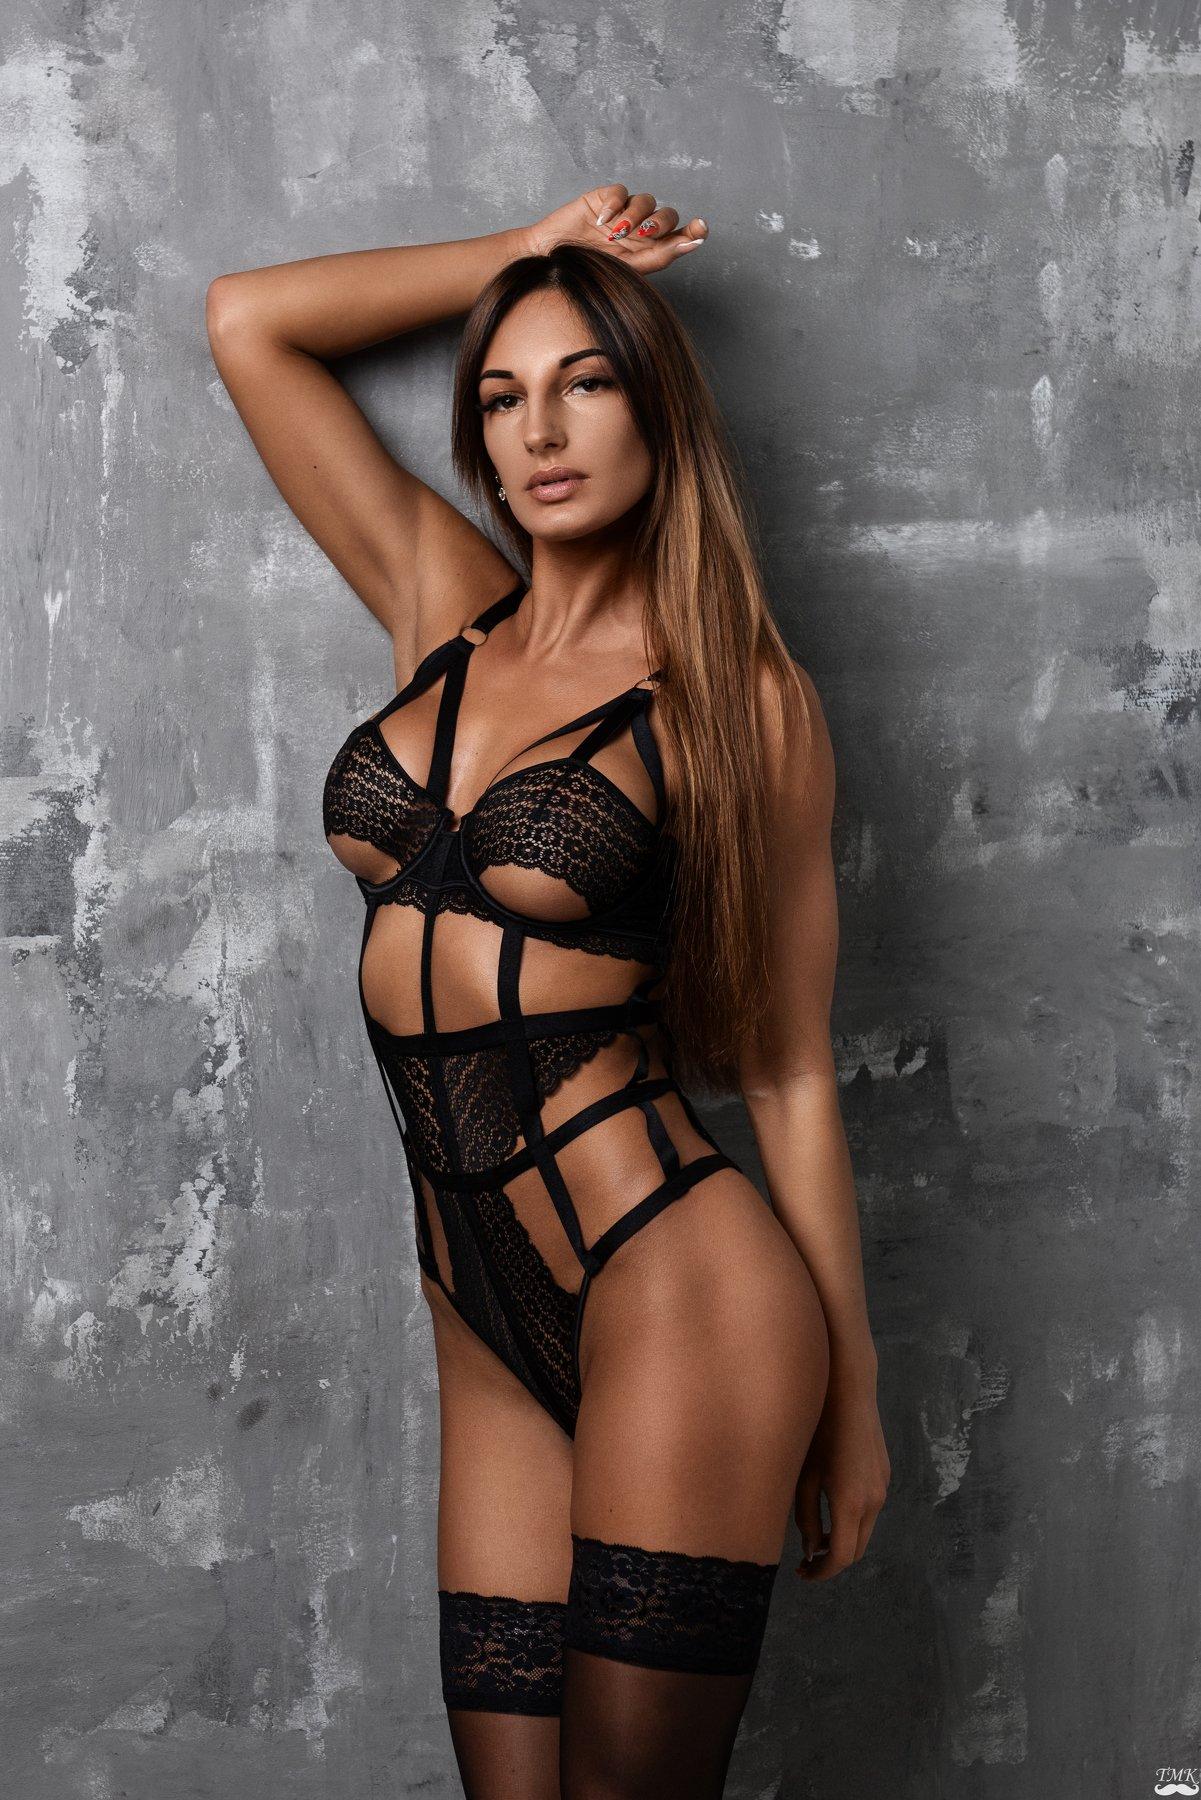 portrait, glamour, woman, beauty, sexy, lingerie, studio, people, lithuania, fit, Masoit Tomas